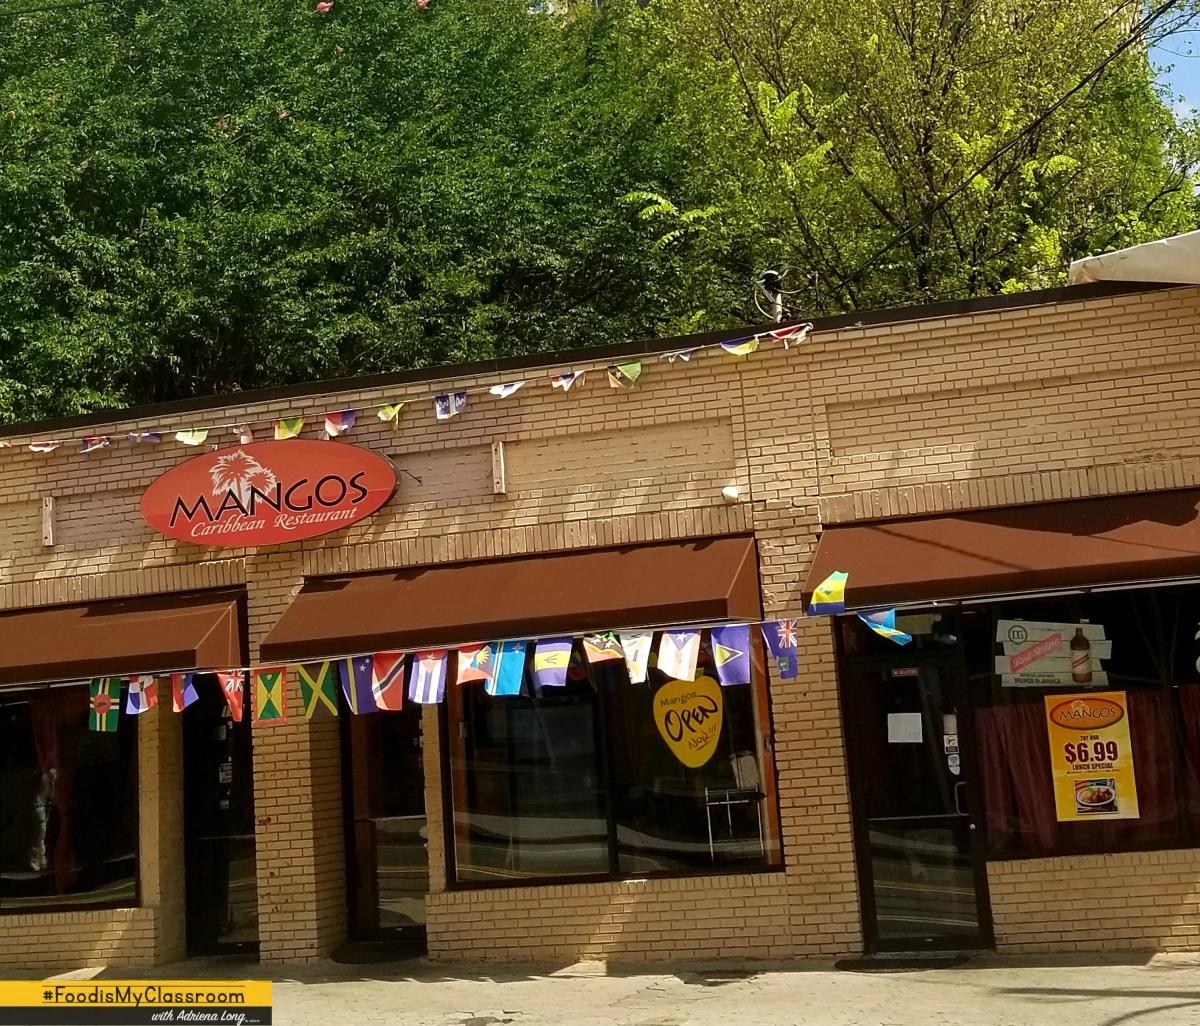 Mangos Caribbean RestaurantReview